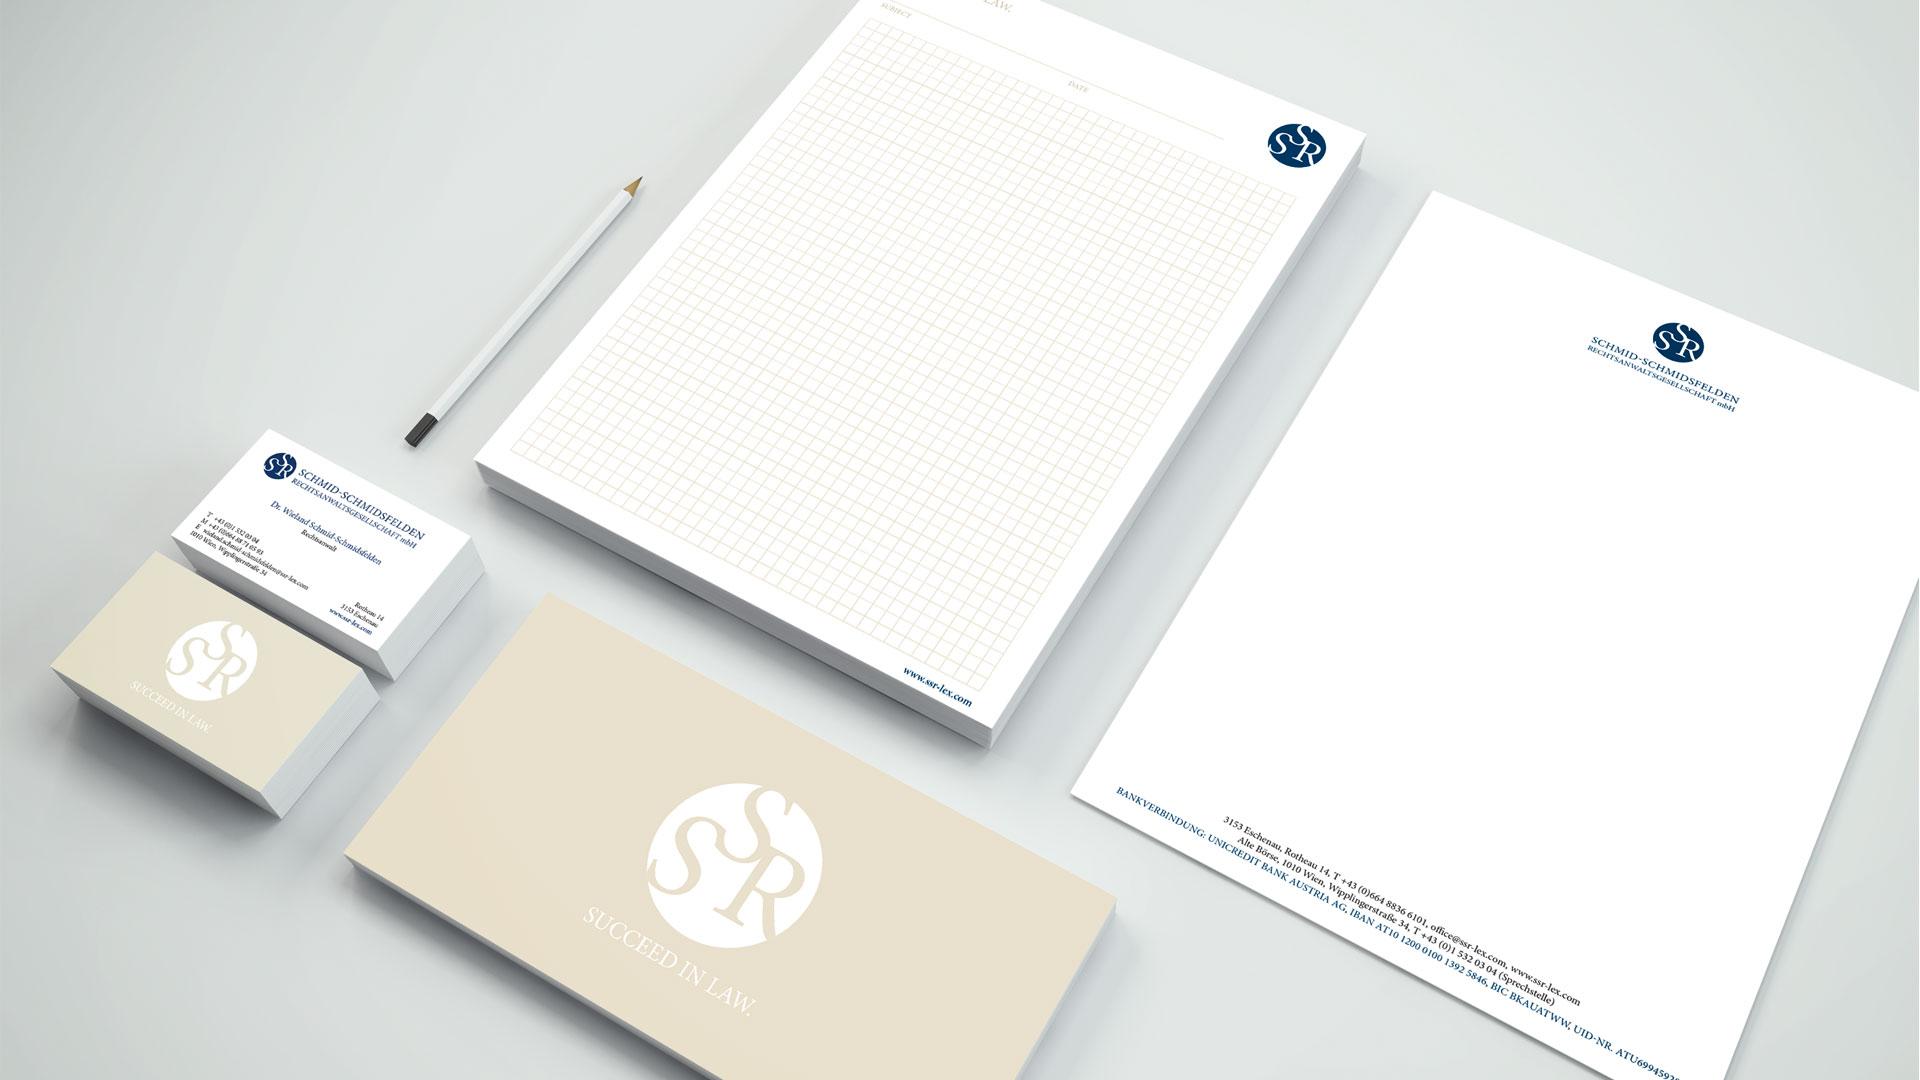 SSR Corporate Design